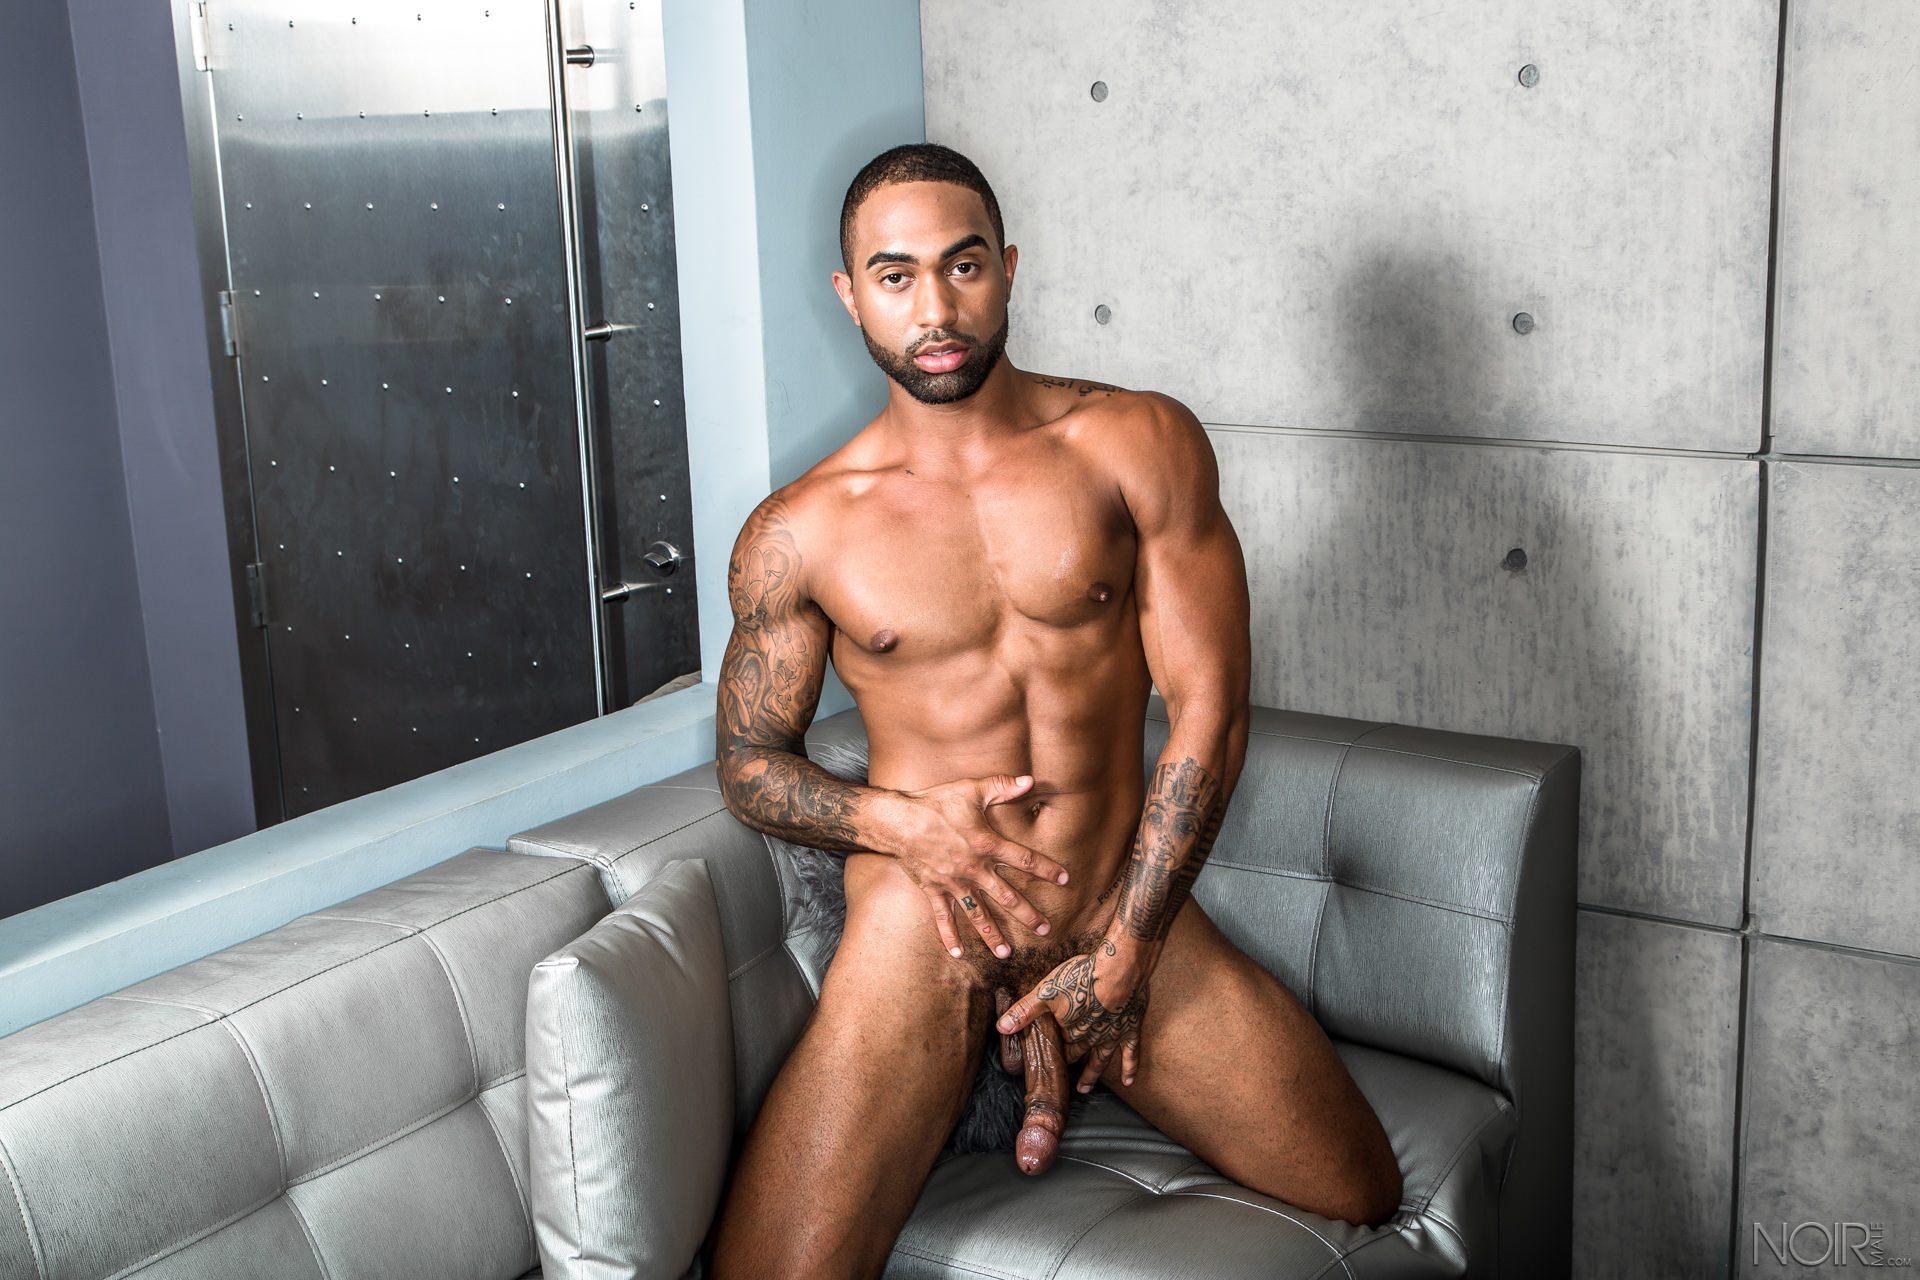 Nude girl jump rope anal